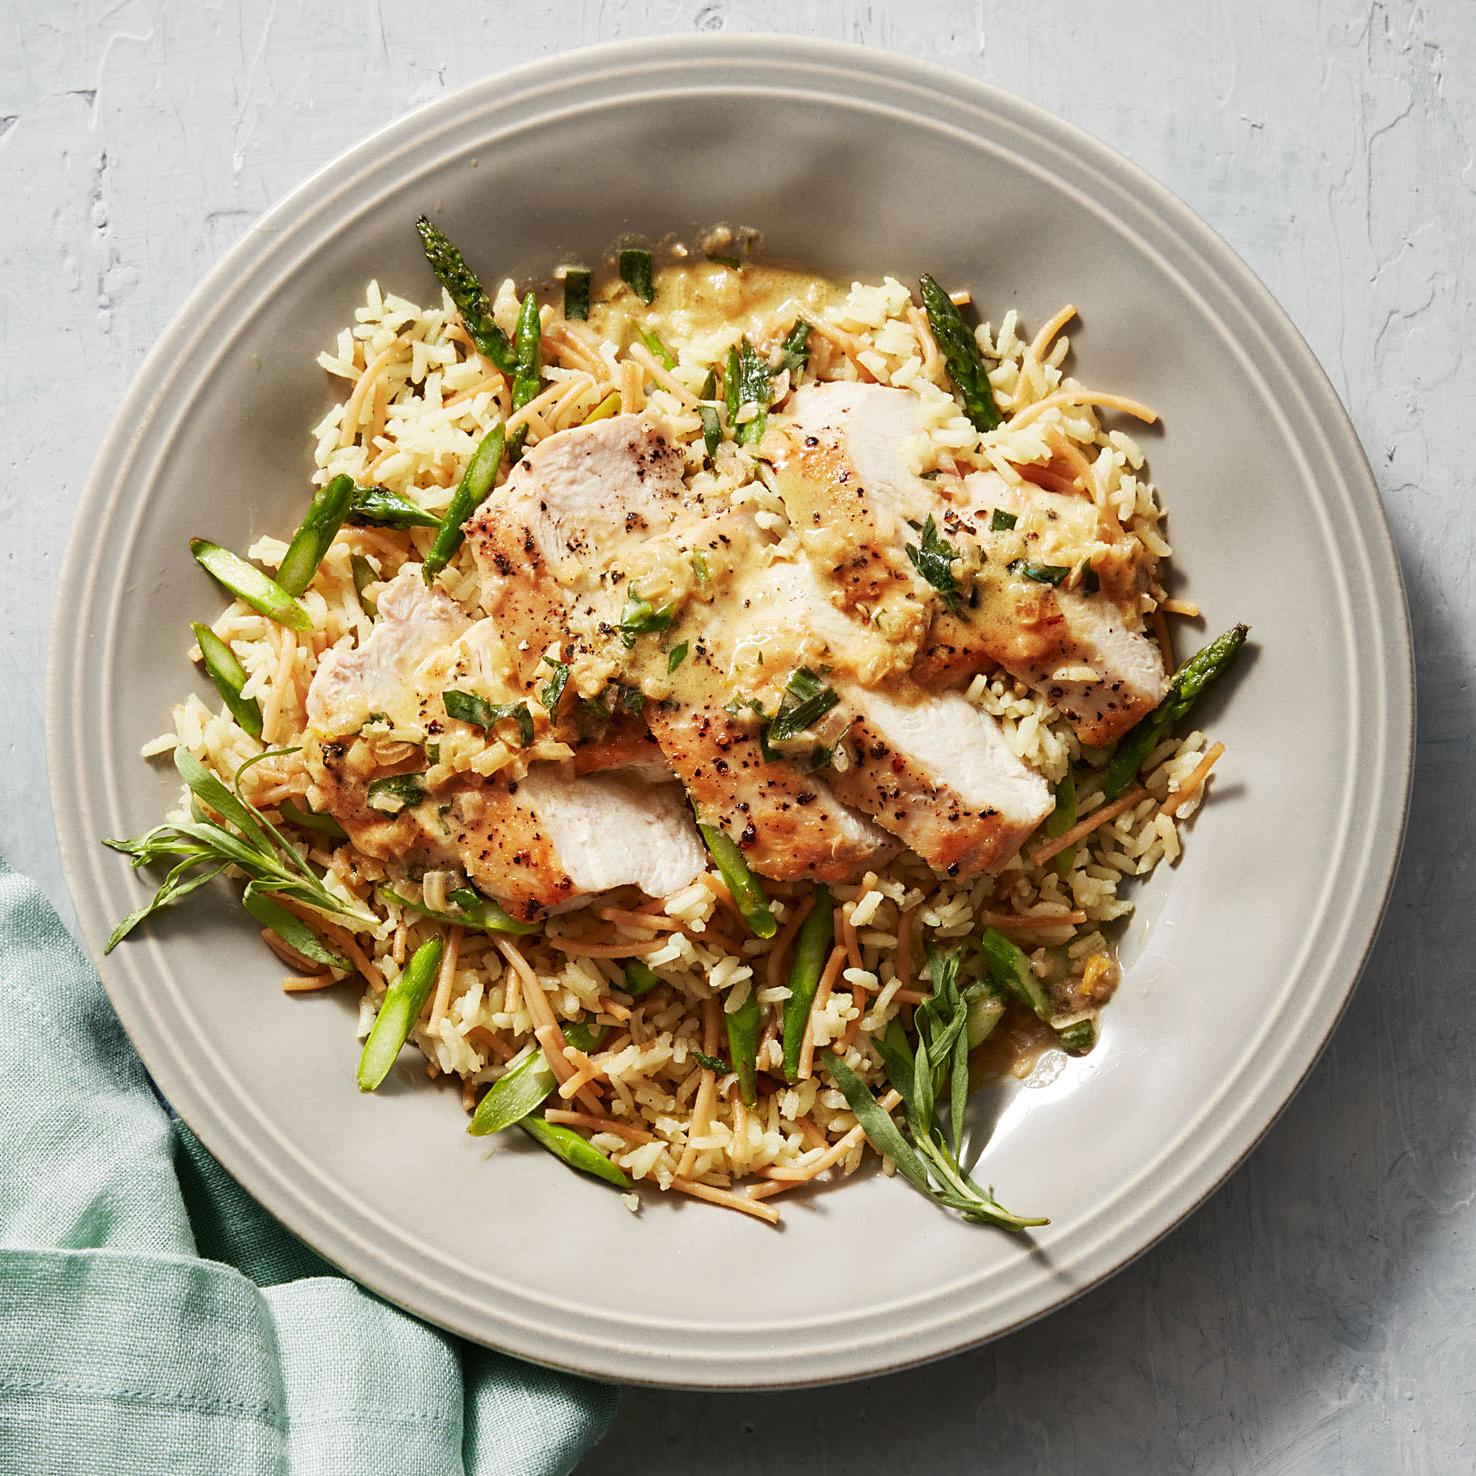 lemon-tarragon chicken with rice